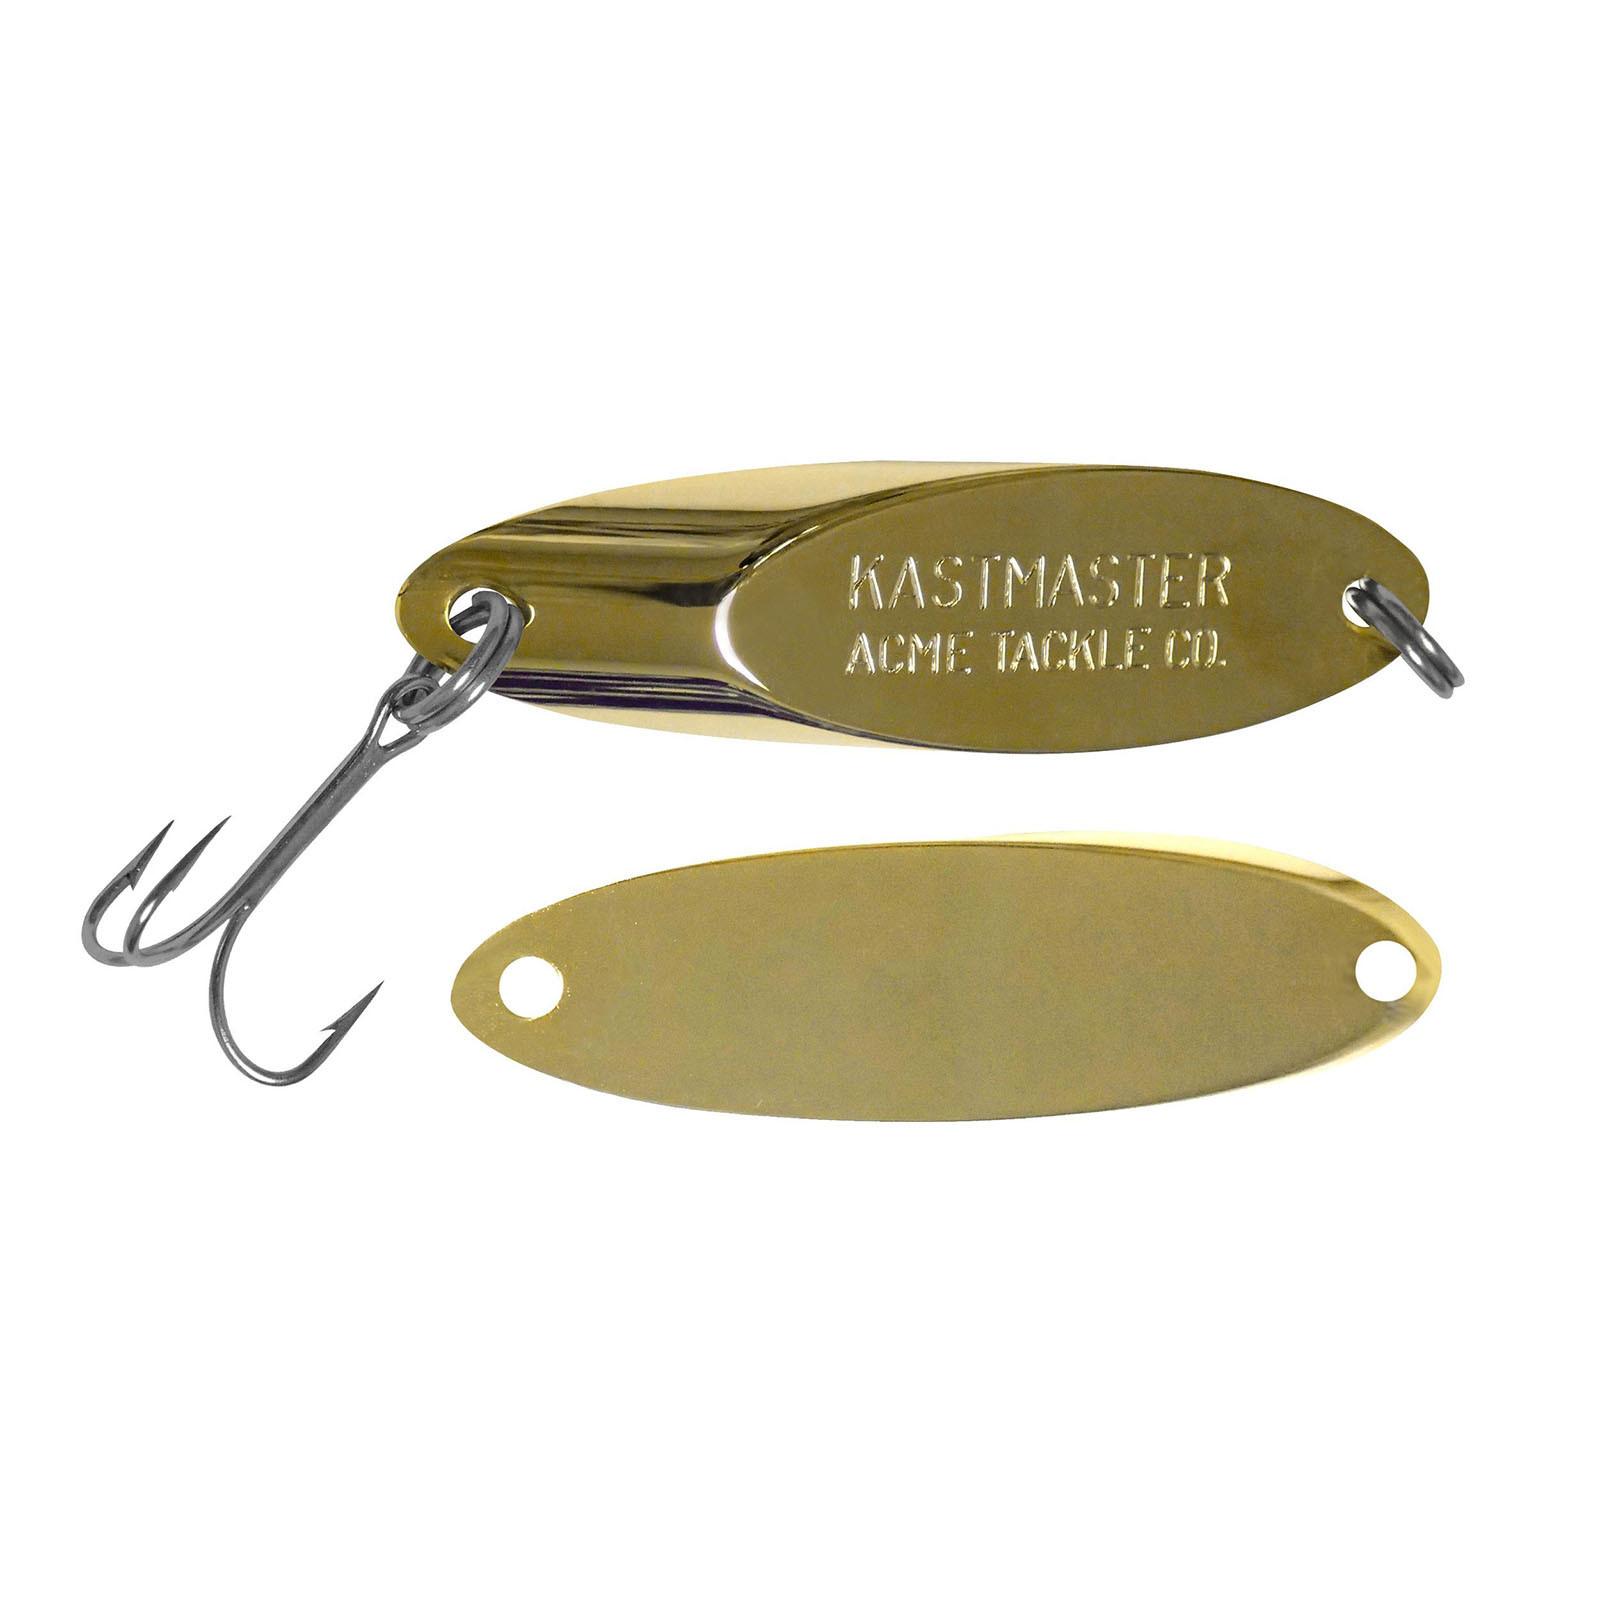 Acme Tackle Company Kastmaster Spoon